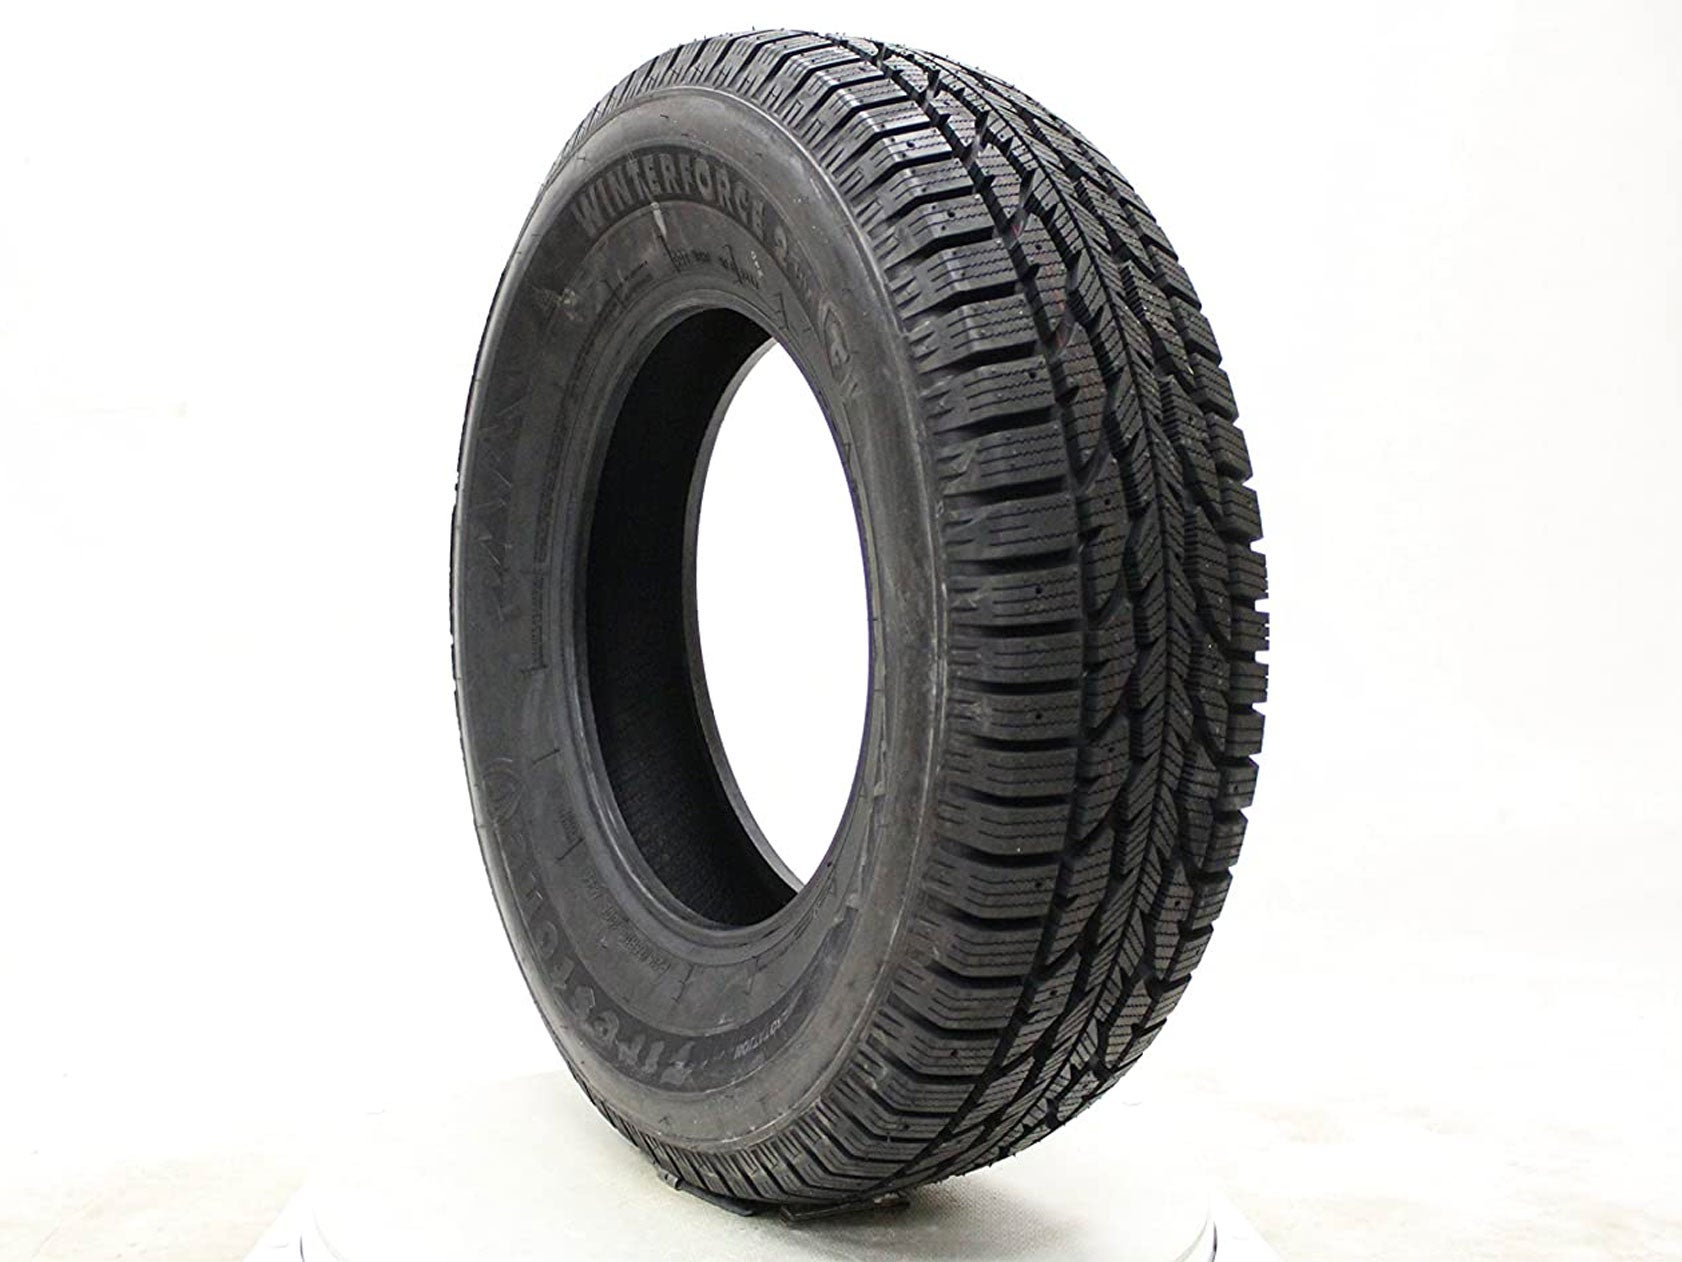 Firestone Winterforce 2 UV Winter/Snow SUV Tire